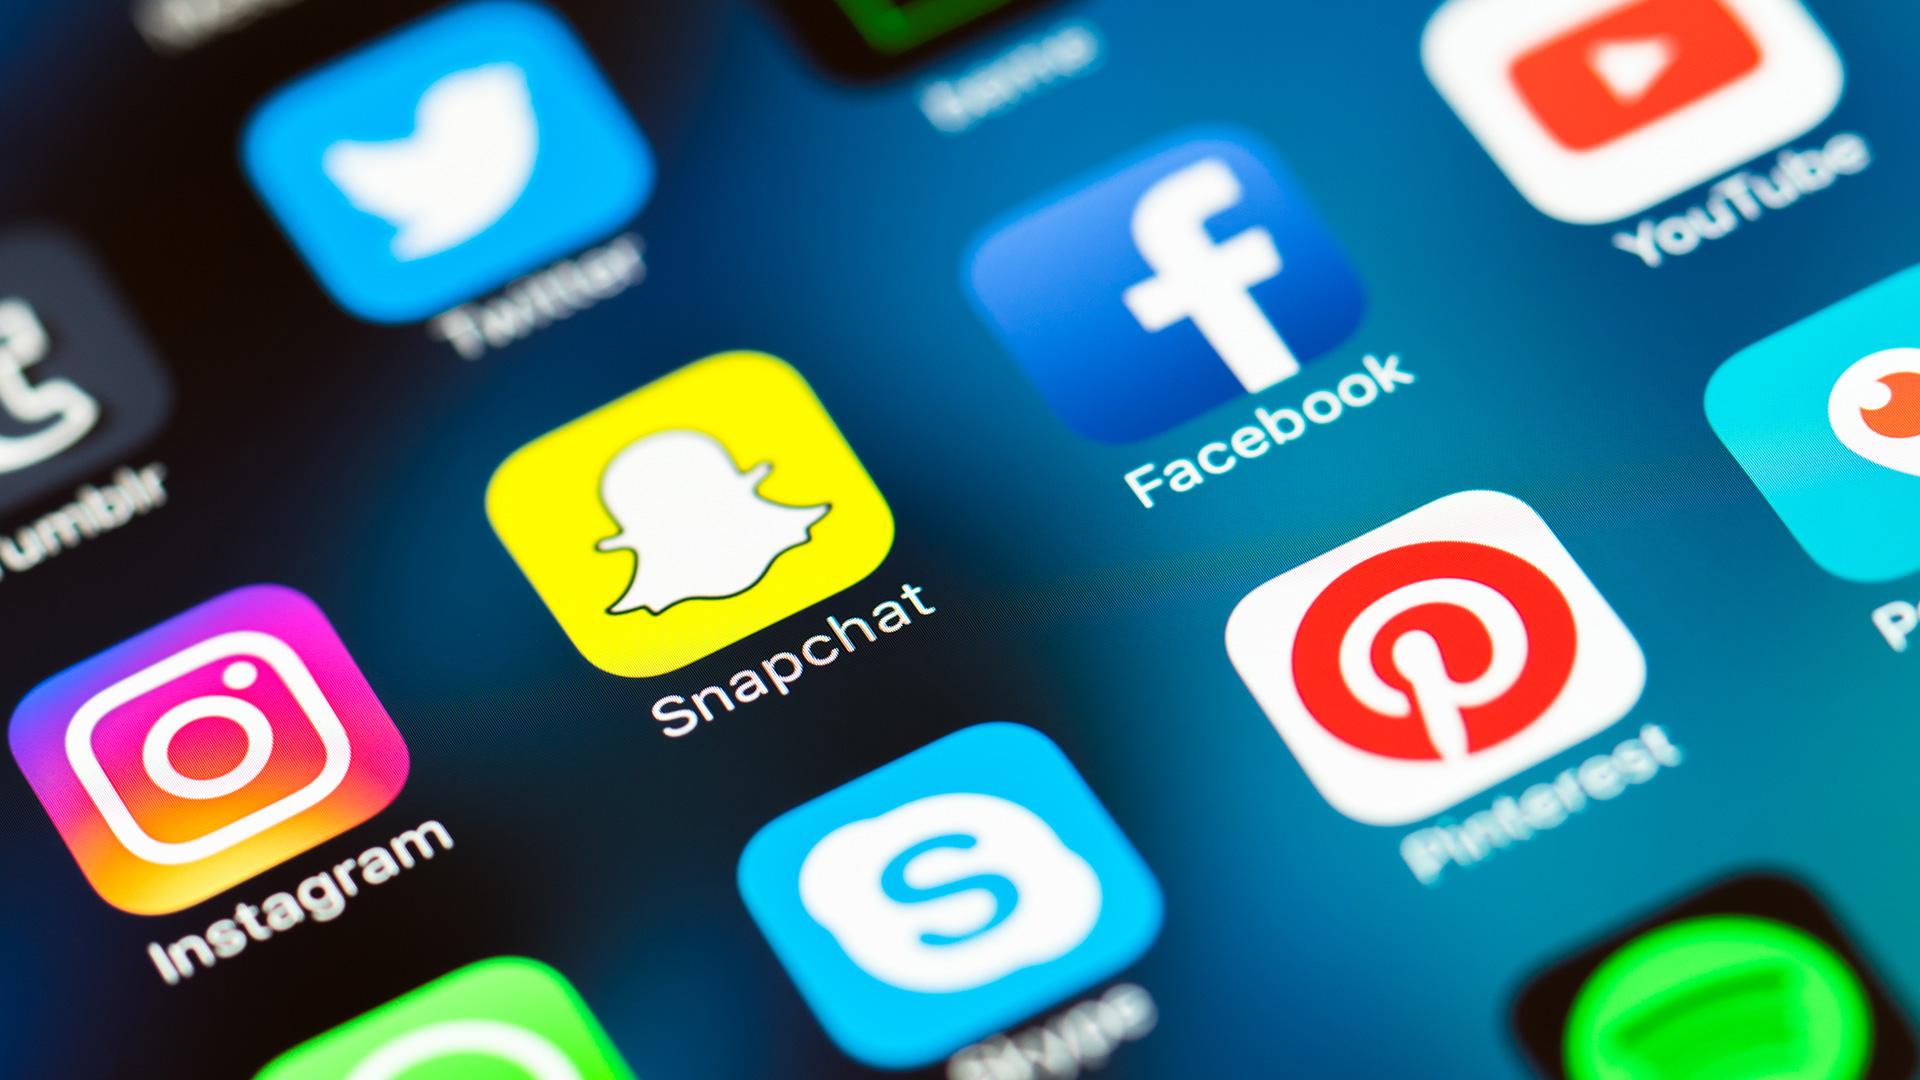 social-media-mobile-icons-snapchat-facebook-instagram-ss-1920